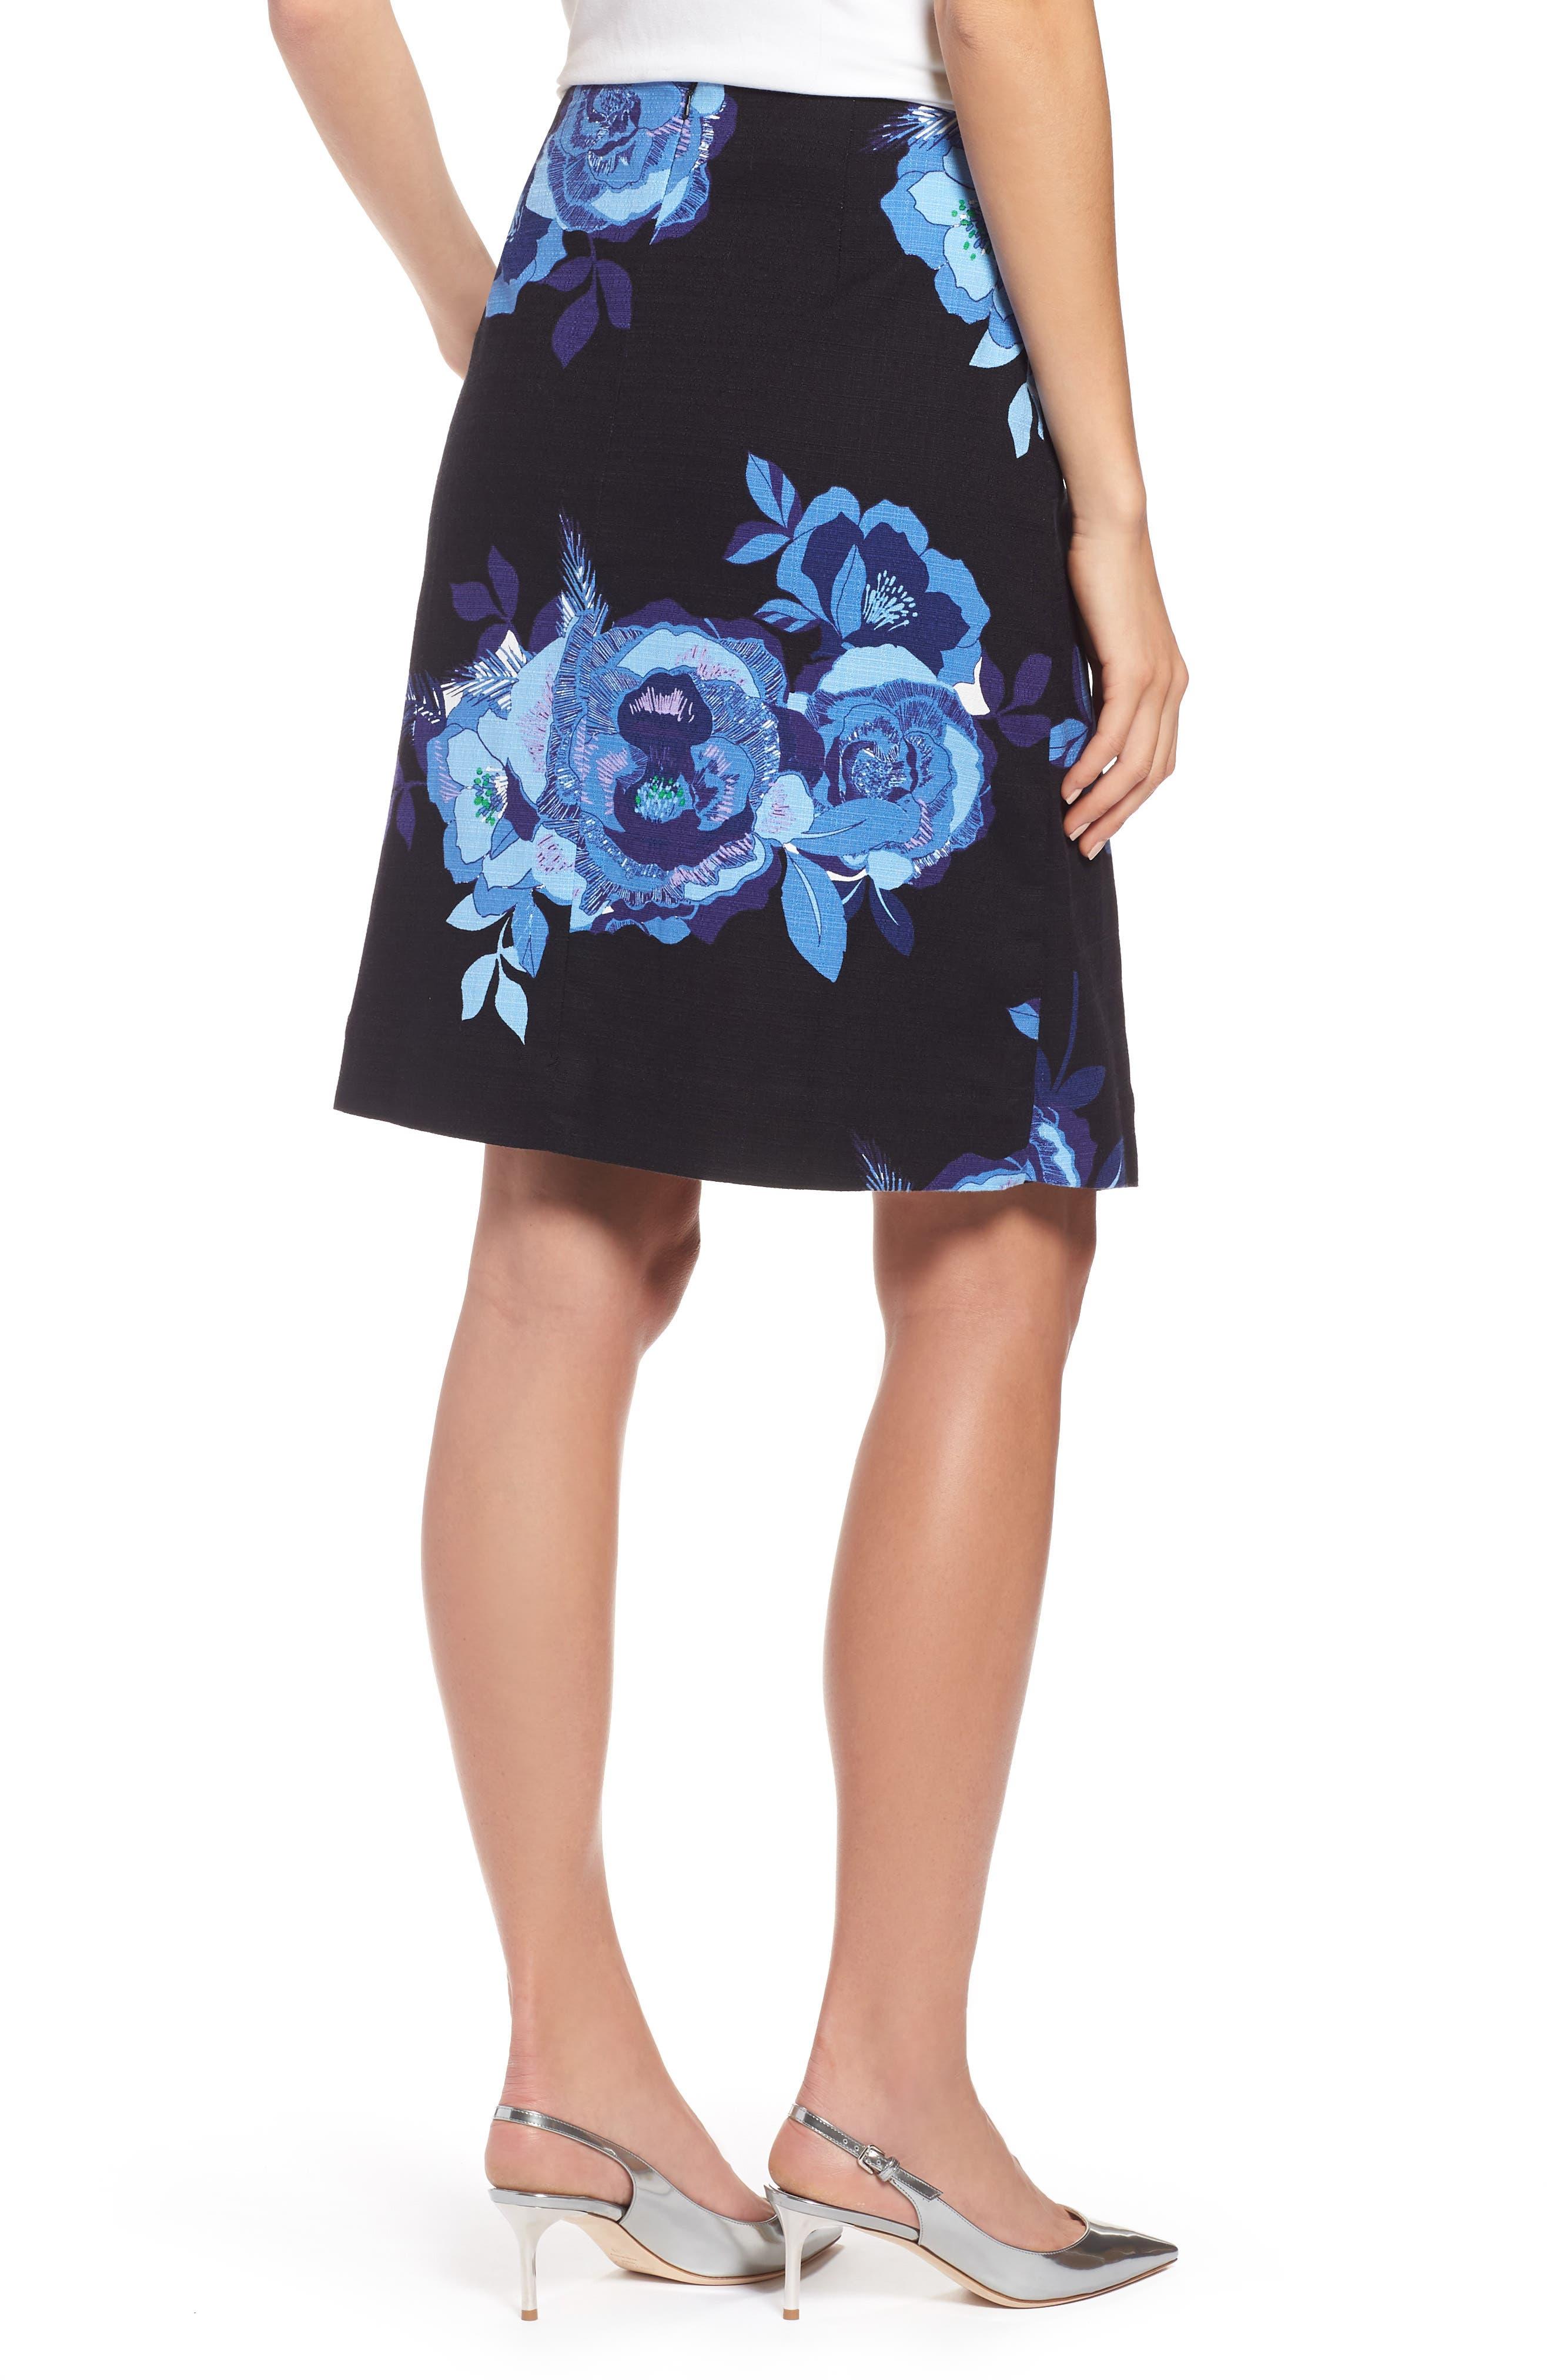 Floral Cotton Blend Wrap Skirt,                             Alternate thumbnail 2, color,                             Black- Blue Rose Print